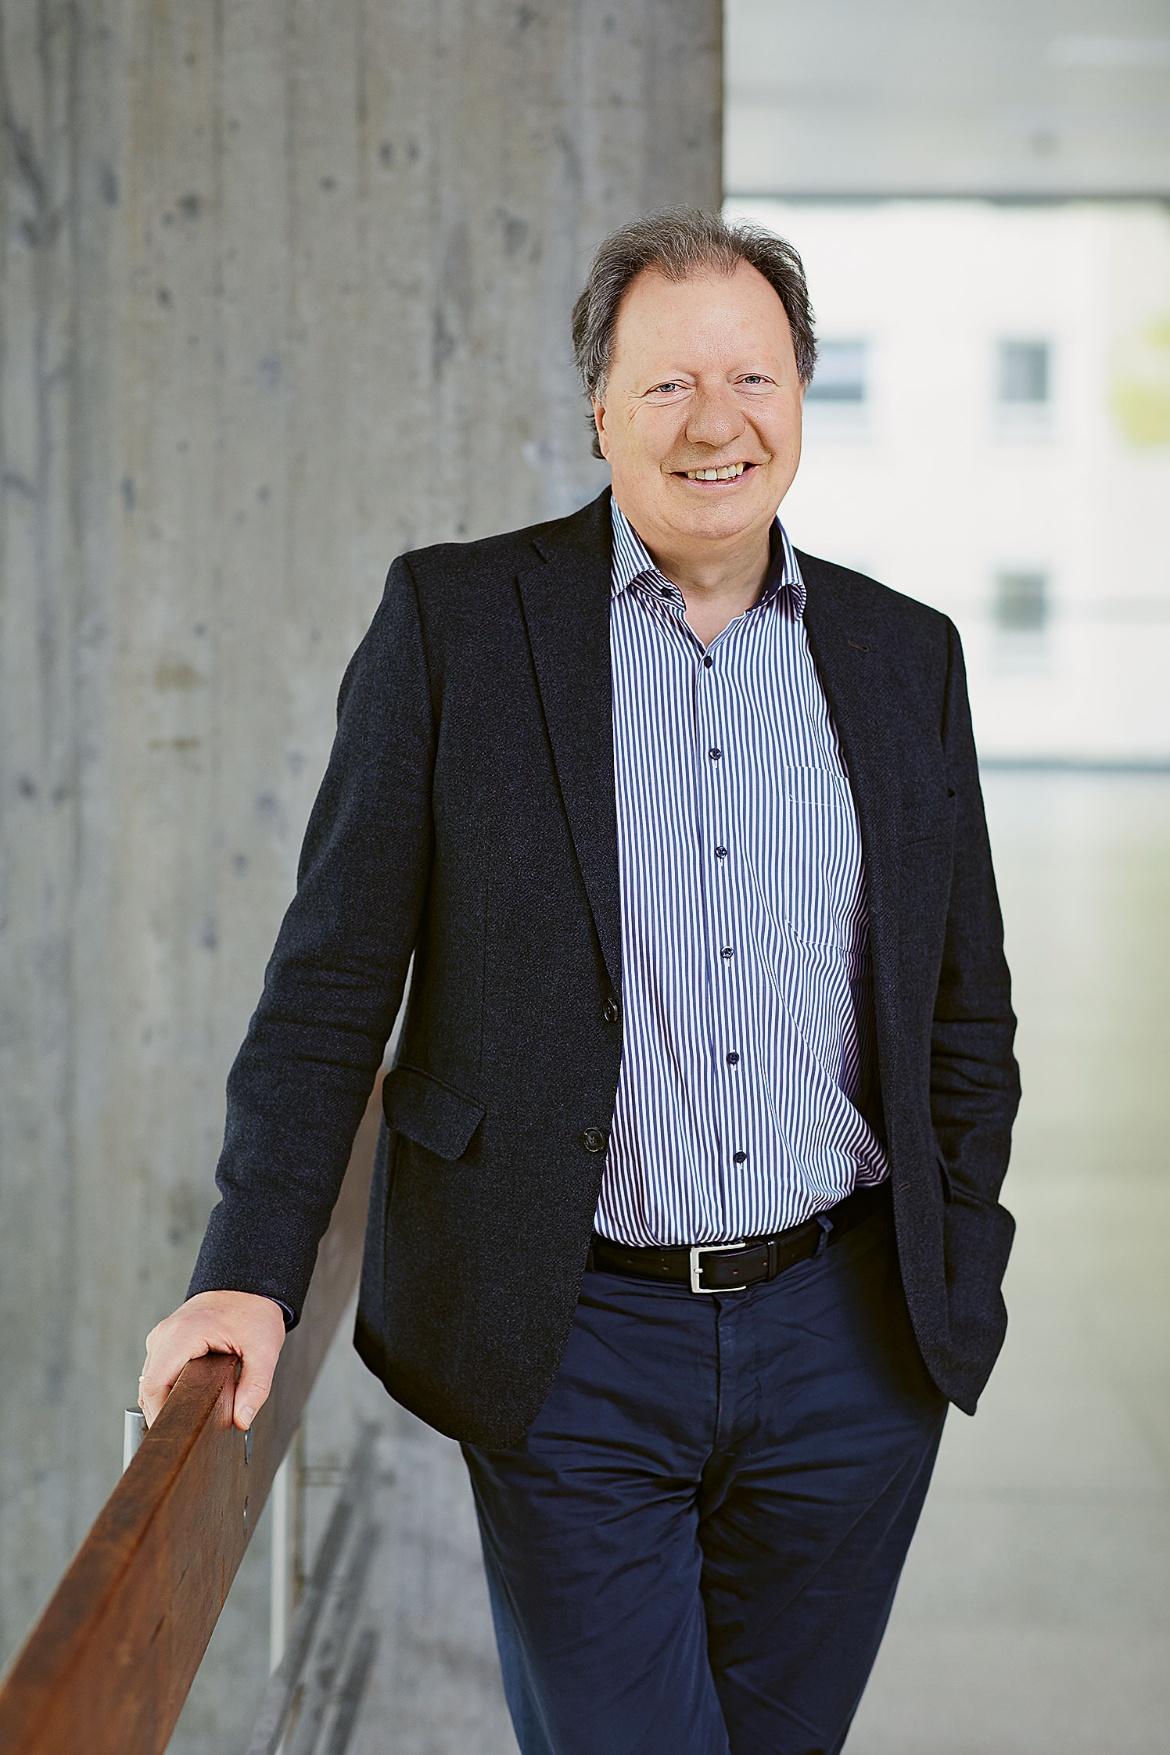 Prof. Wolfram Ressel, Rector of the University of Stuttgart.